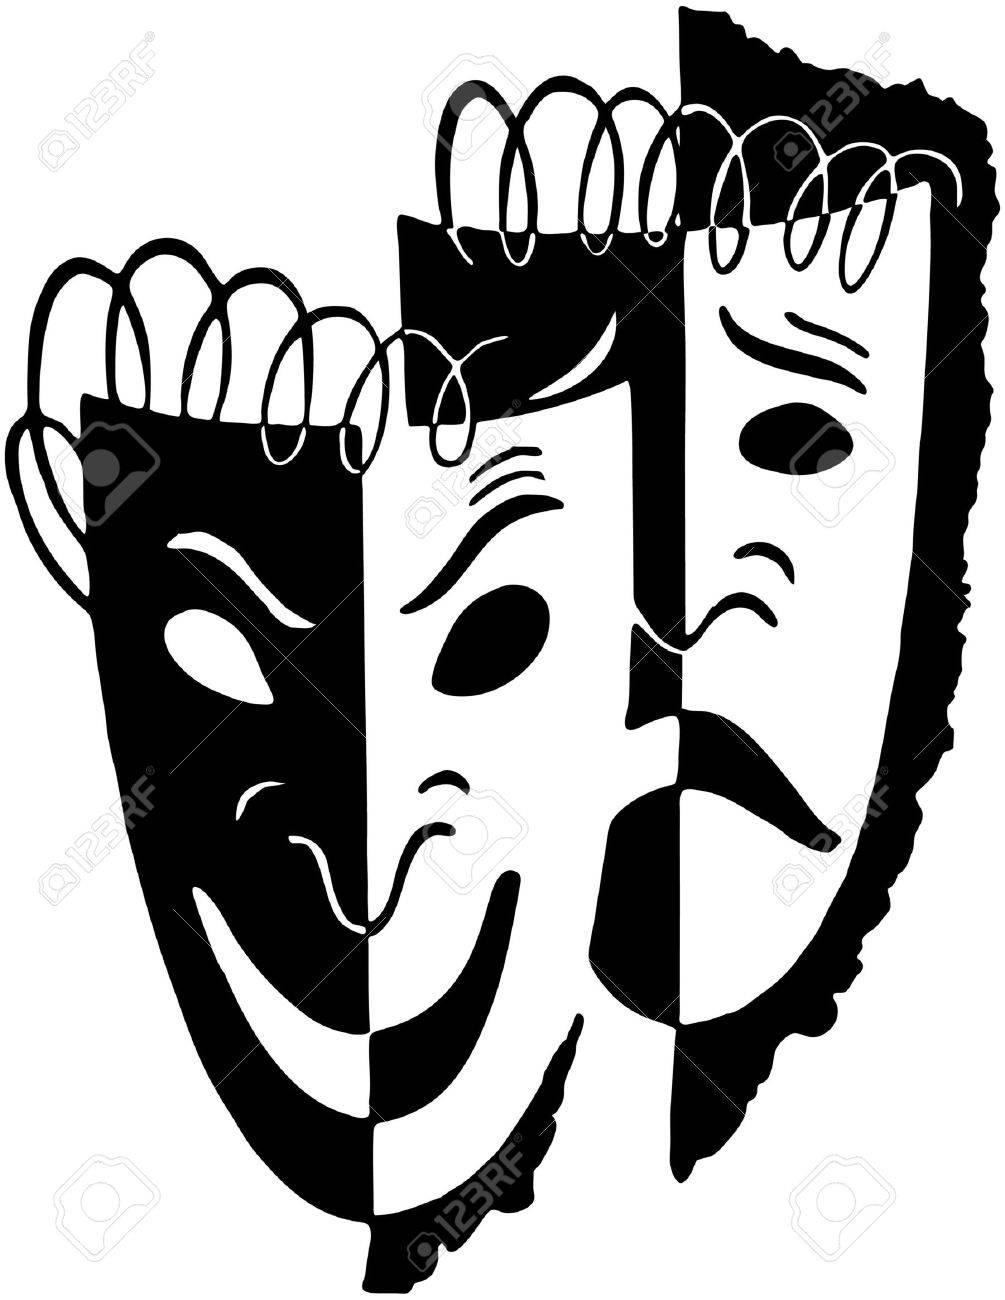 Comedy Drama Masks - 28334424